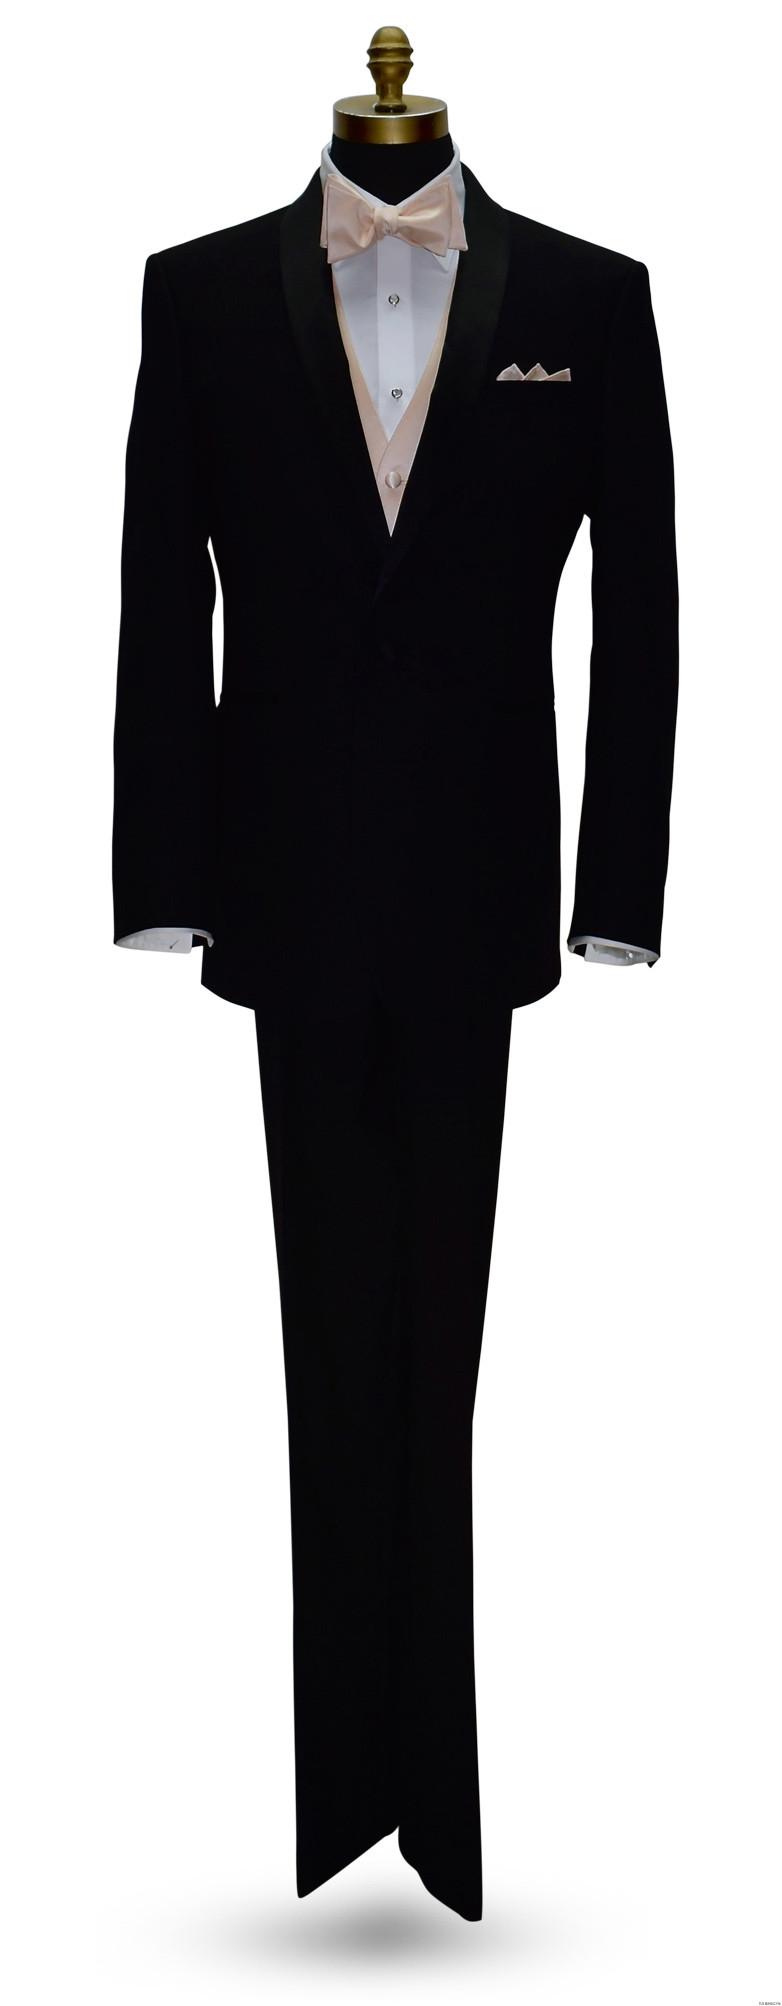 black tuxedo with nude vest and nude self-tie bowtie